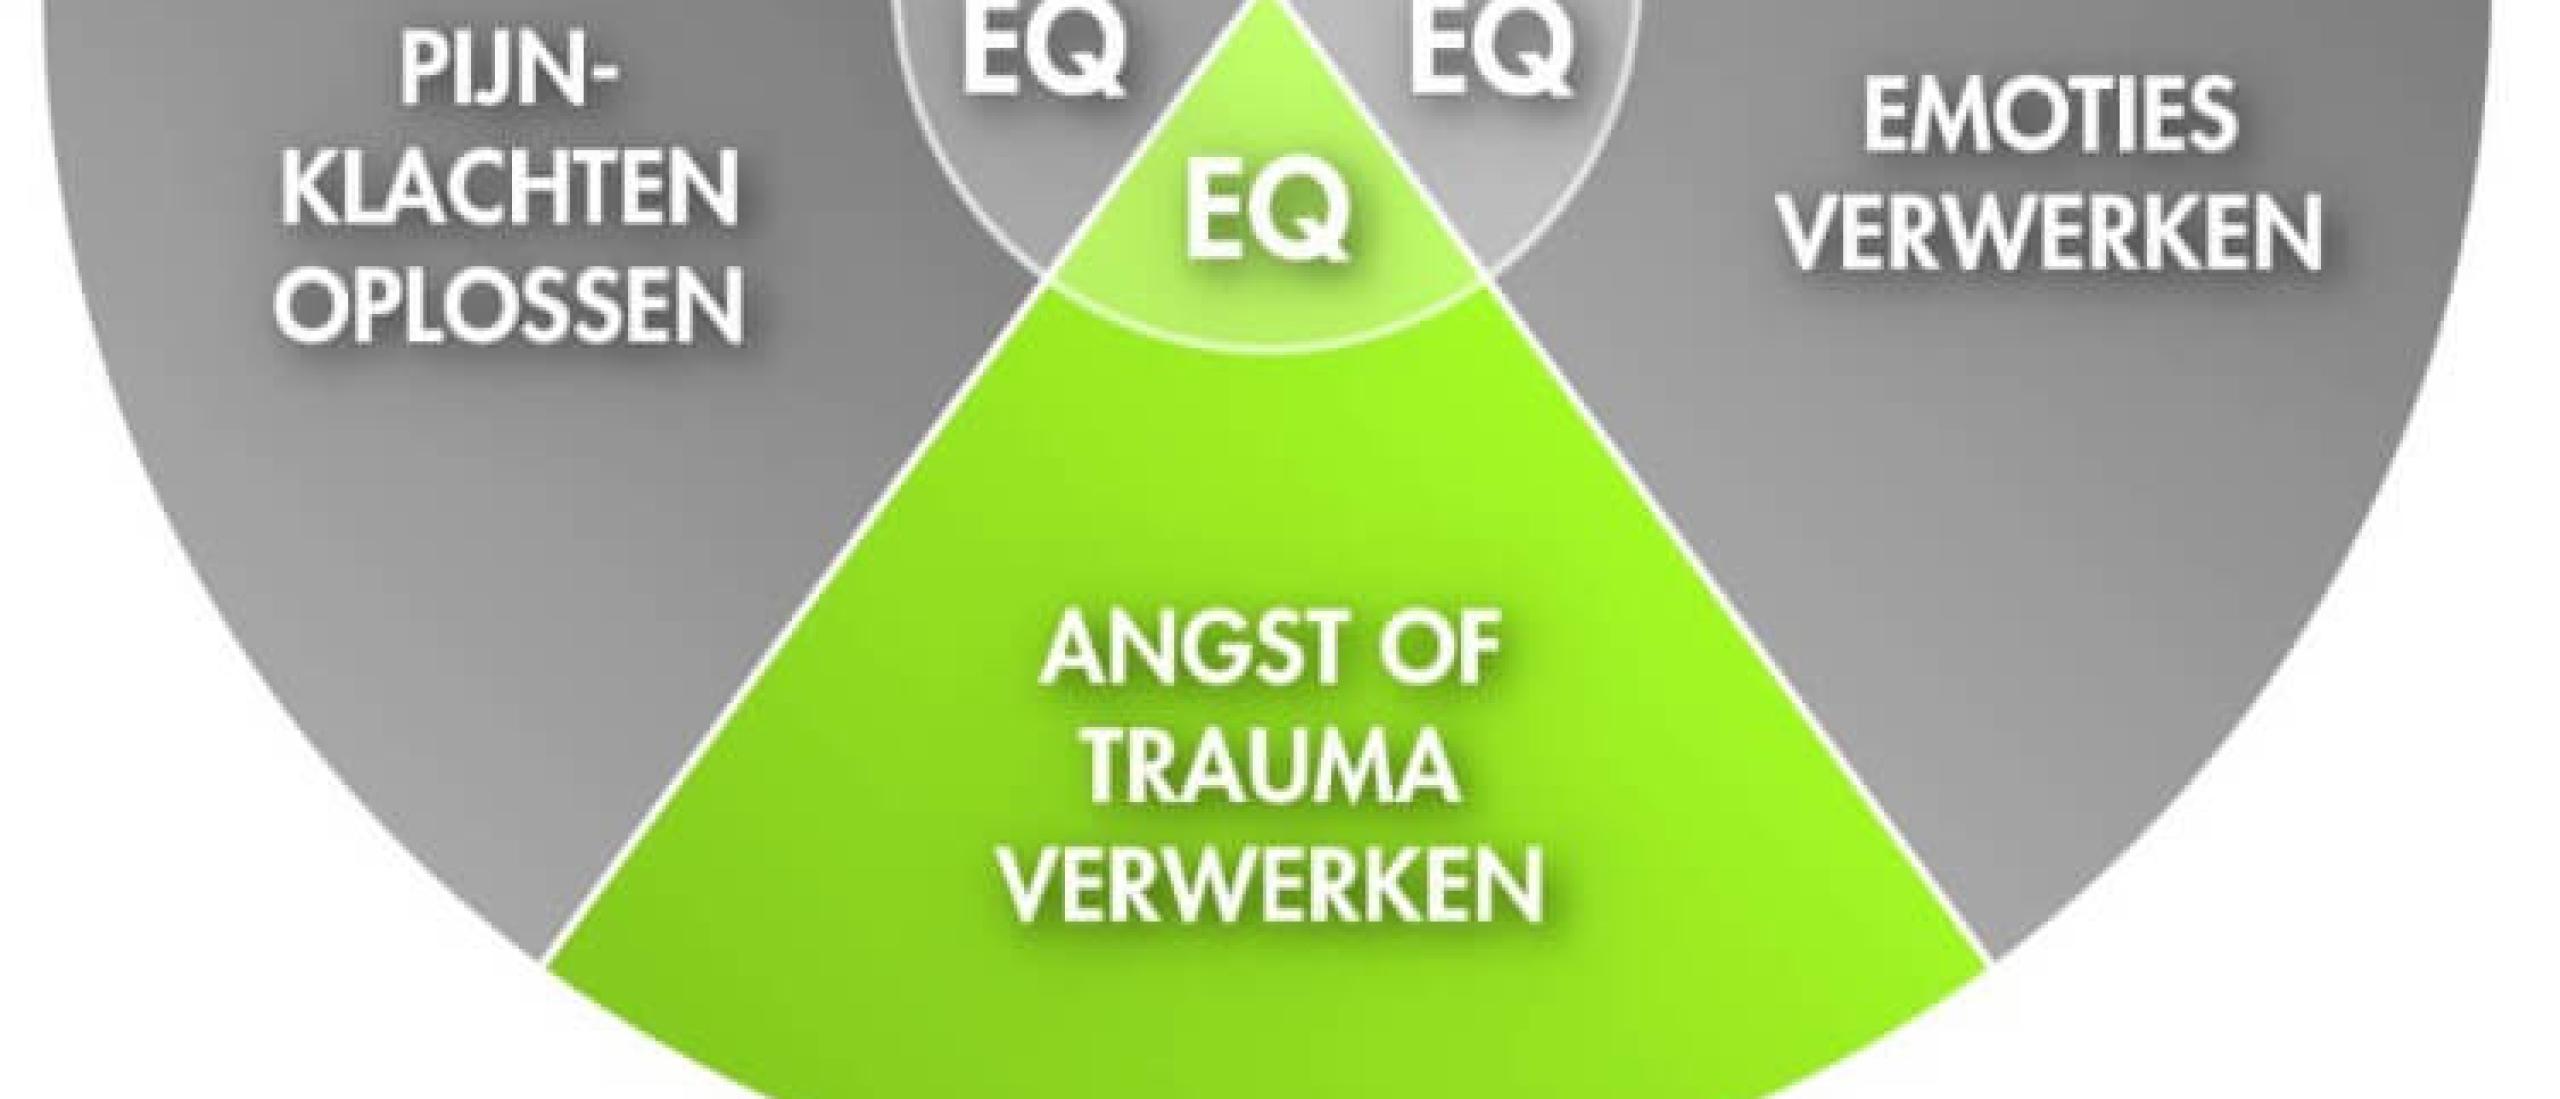 Over trauma's